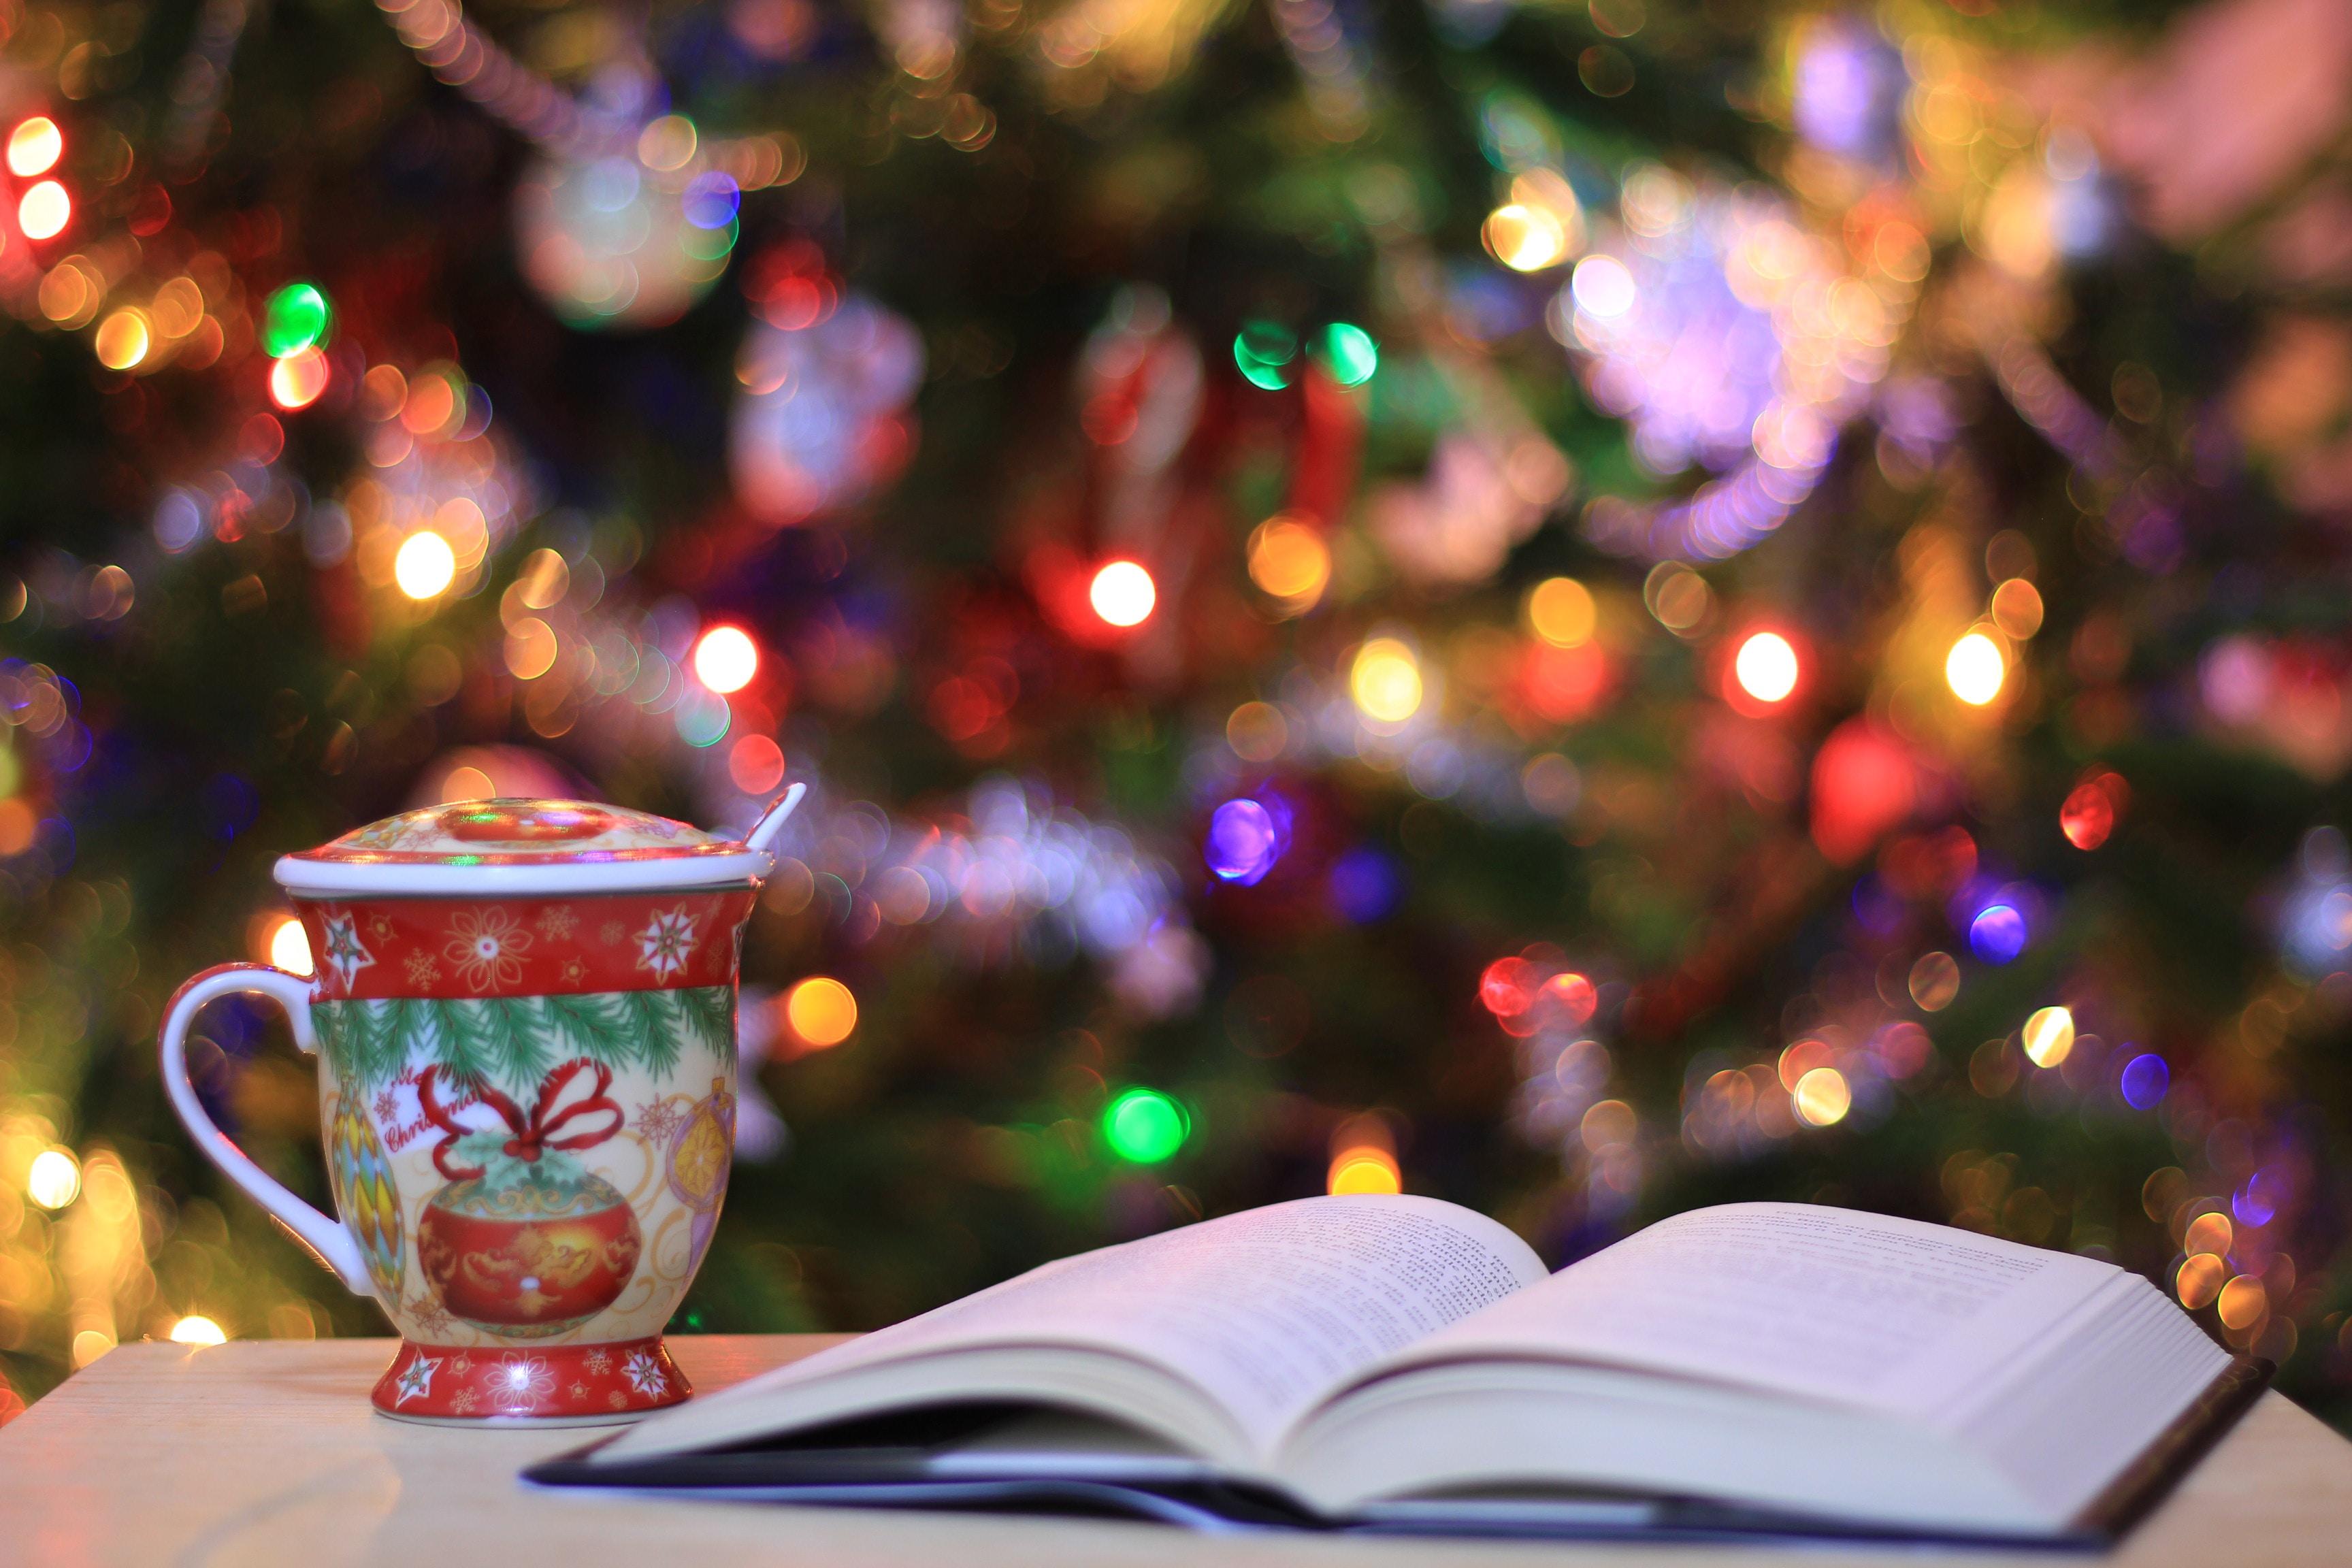 red and green ceramic mug beside book